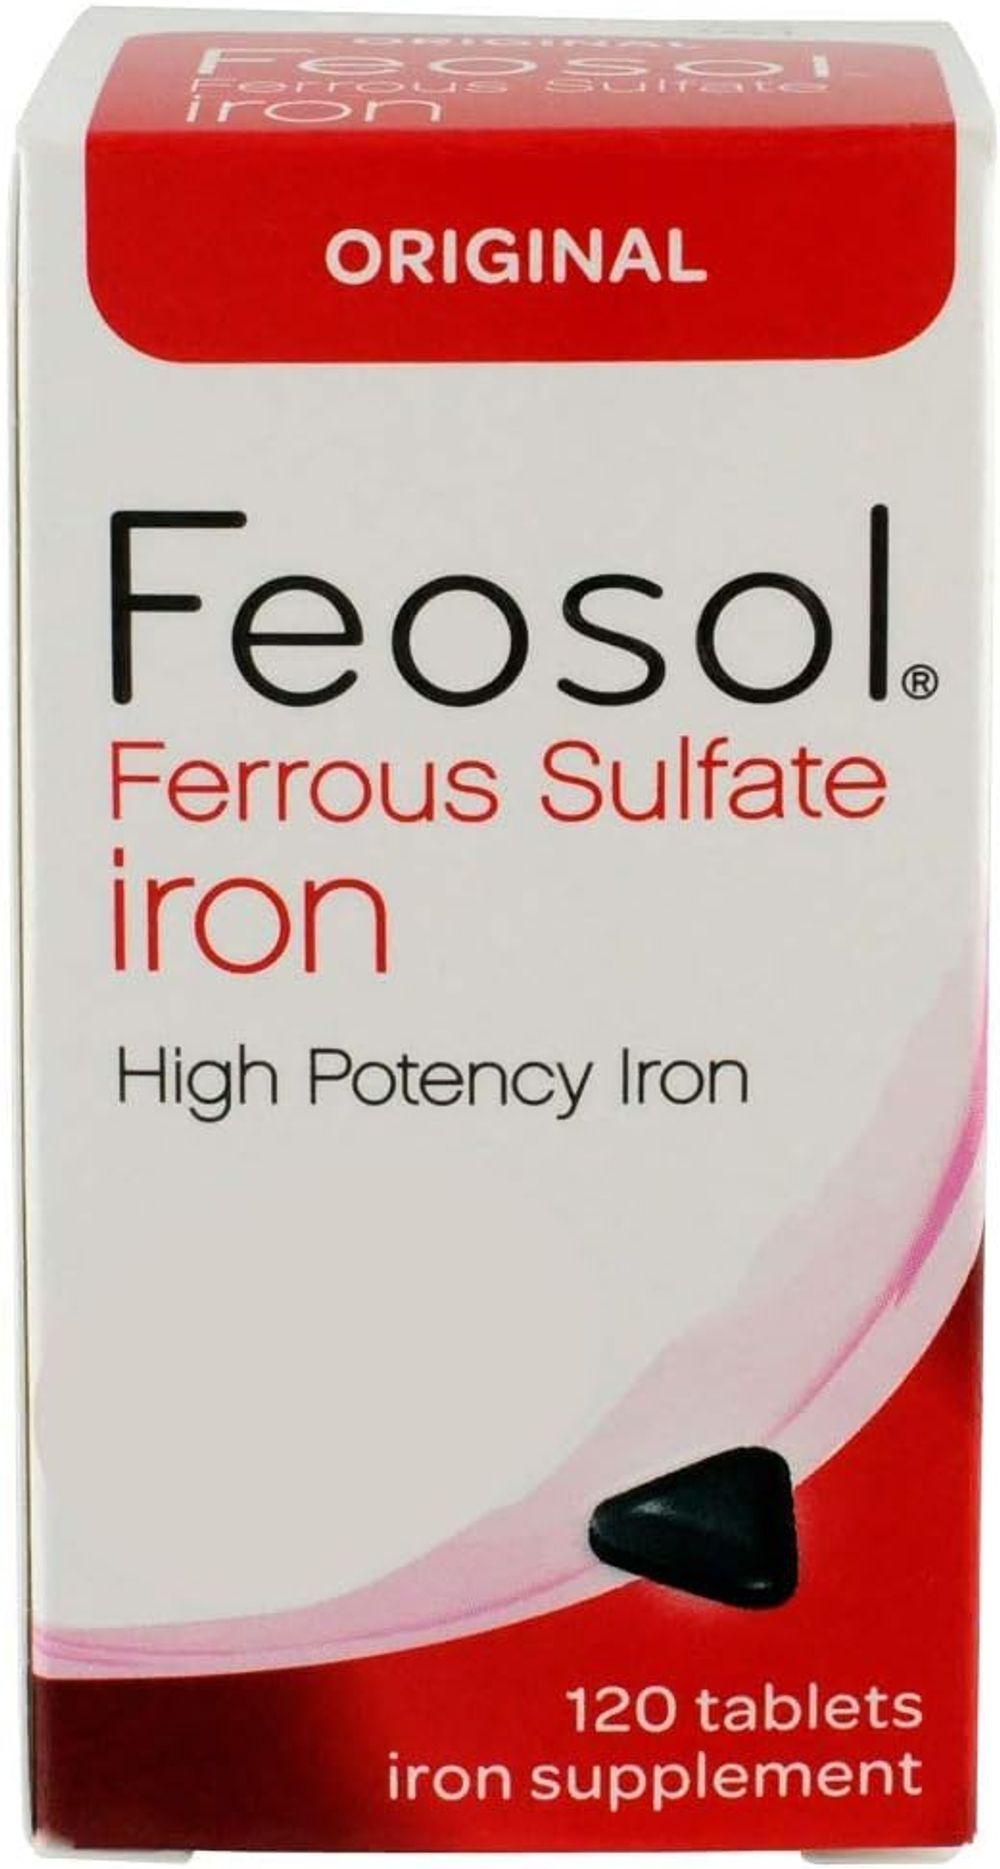 Feosol Original Ferrous Sulfate Iron, 120 Count, High Potency Iron Supplement, White